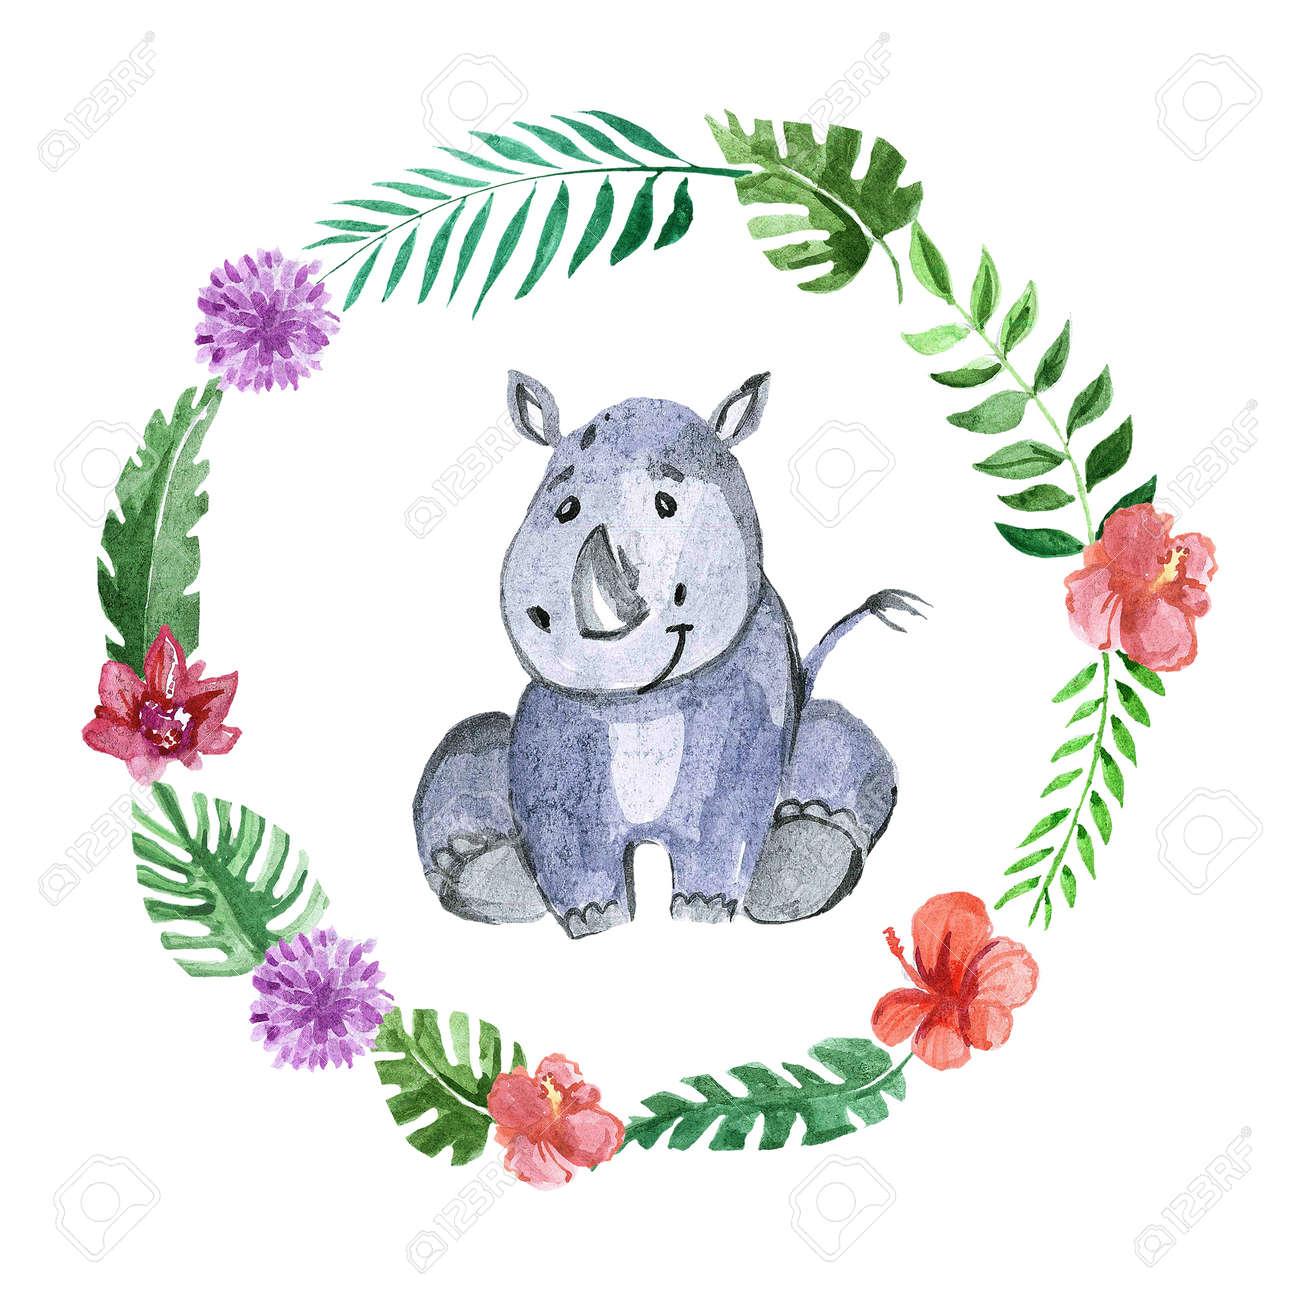 Cute baby rhino Animal for kindergarten, nursery, children clothing, kids pattern, invitation, baby shower - 67279887